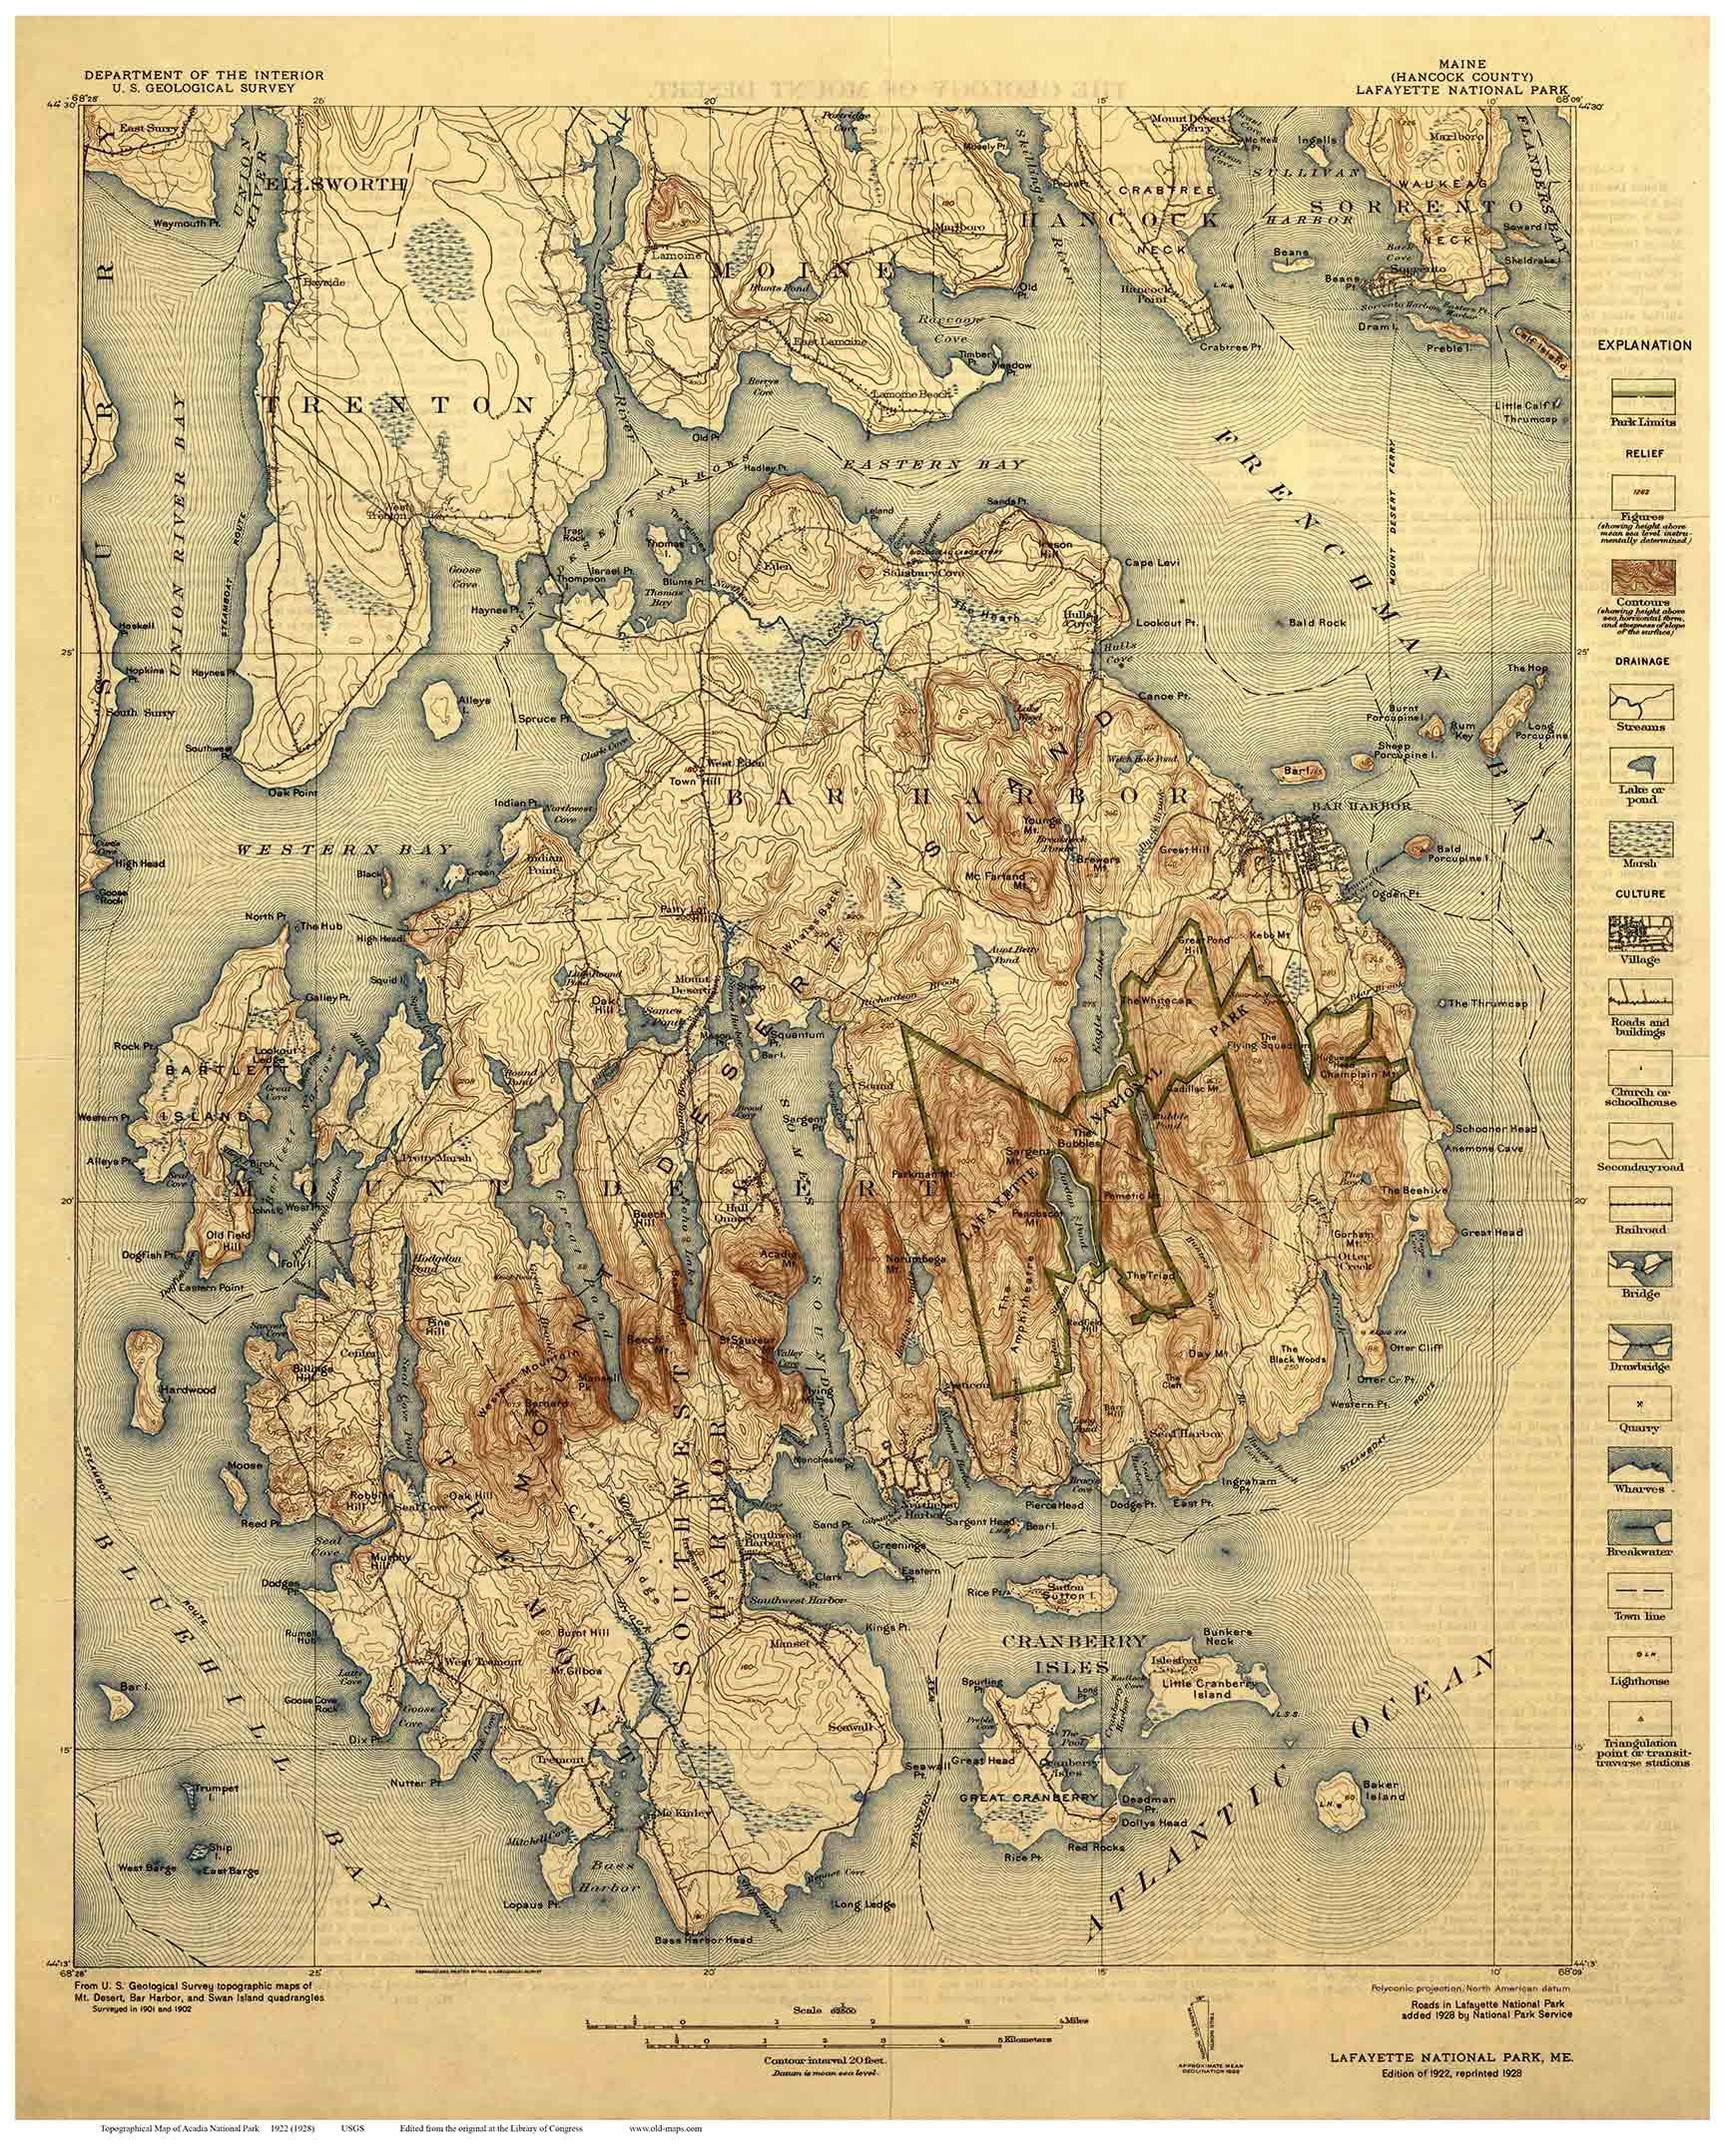 MtDesert_1922_1928_USGS_Acadia_web